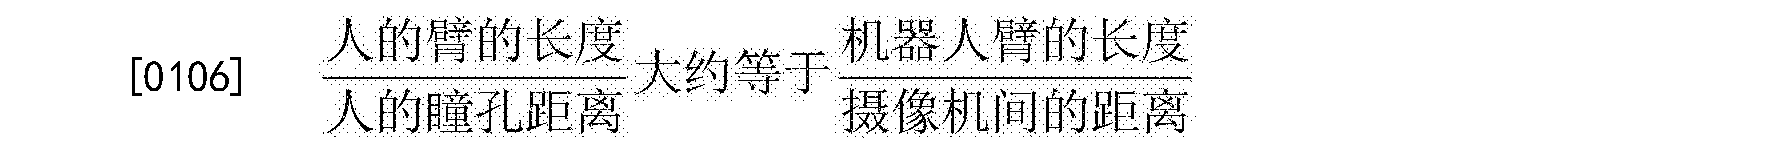 Figure CN106456145AD00151